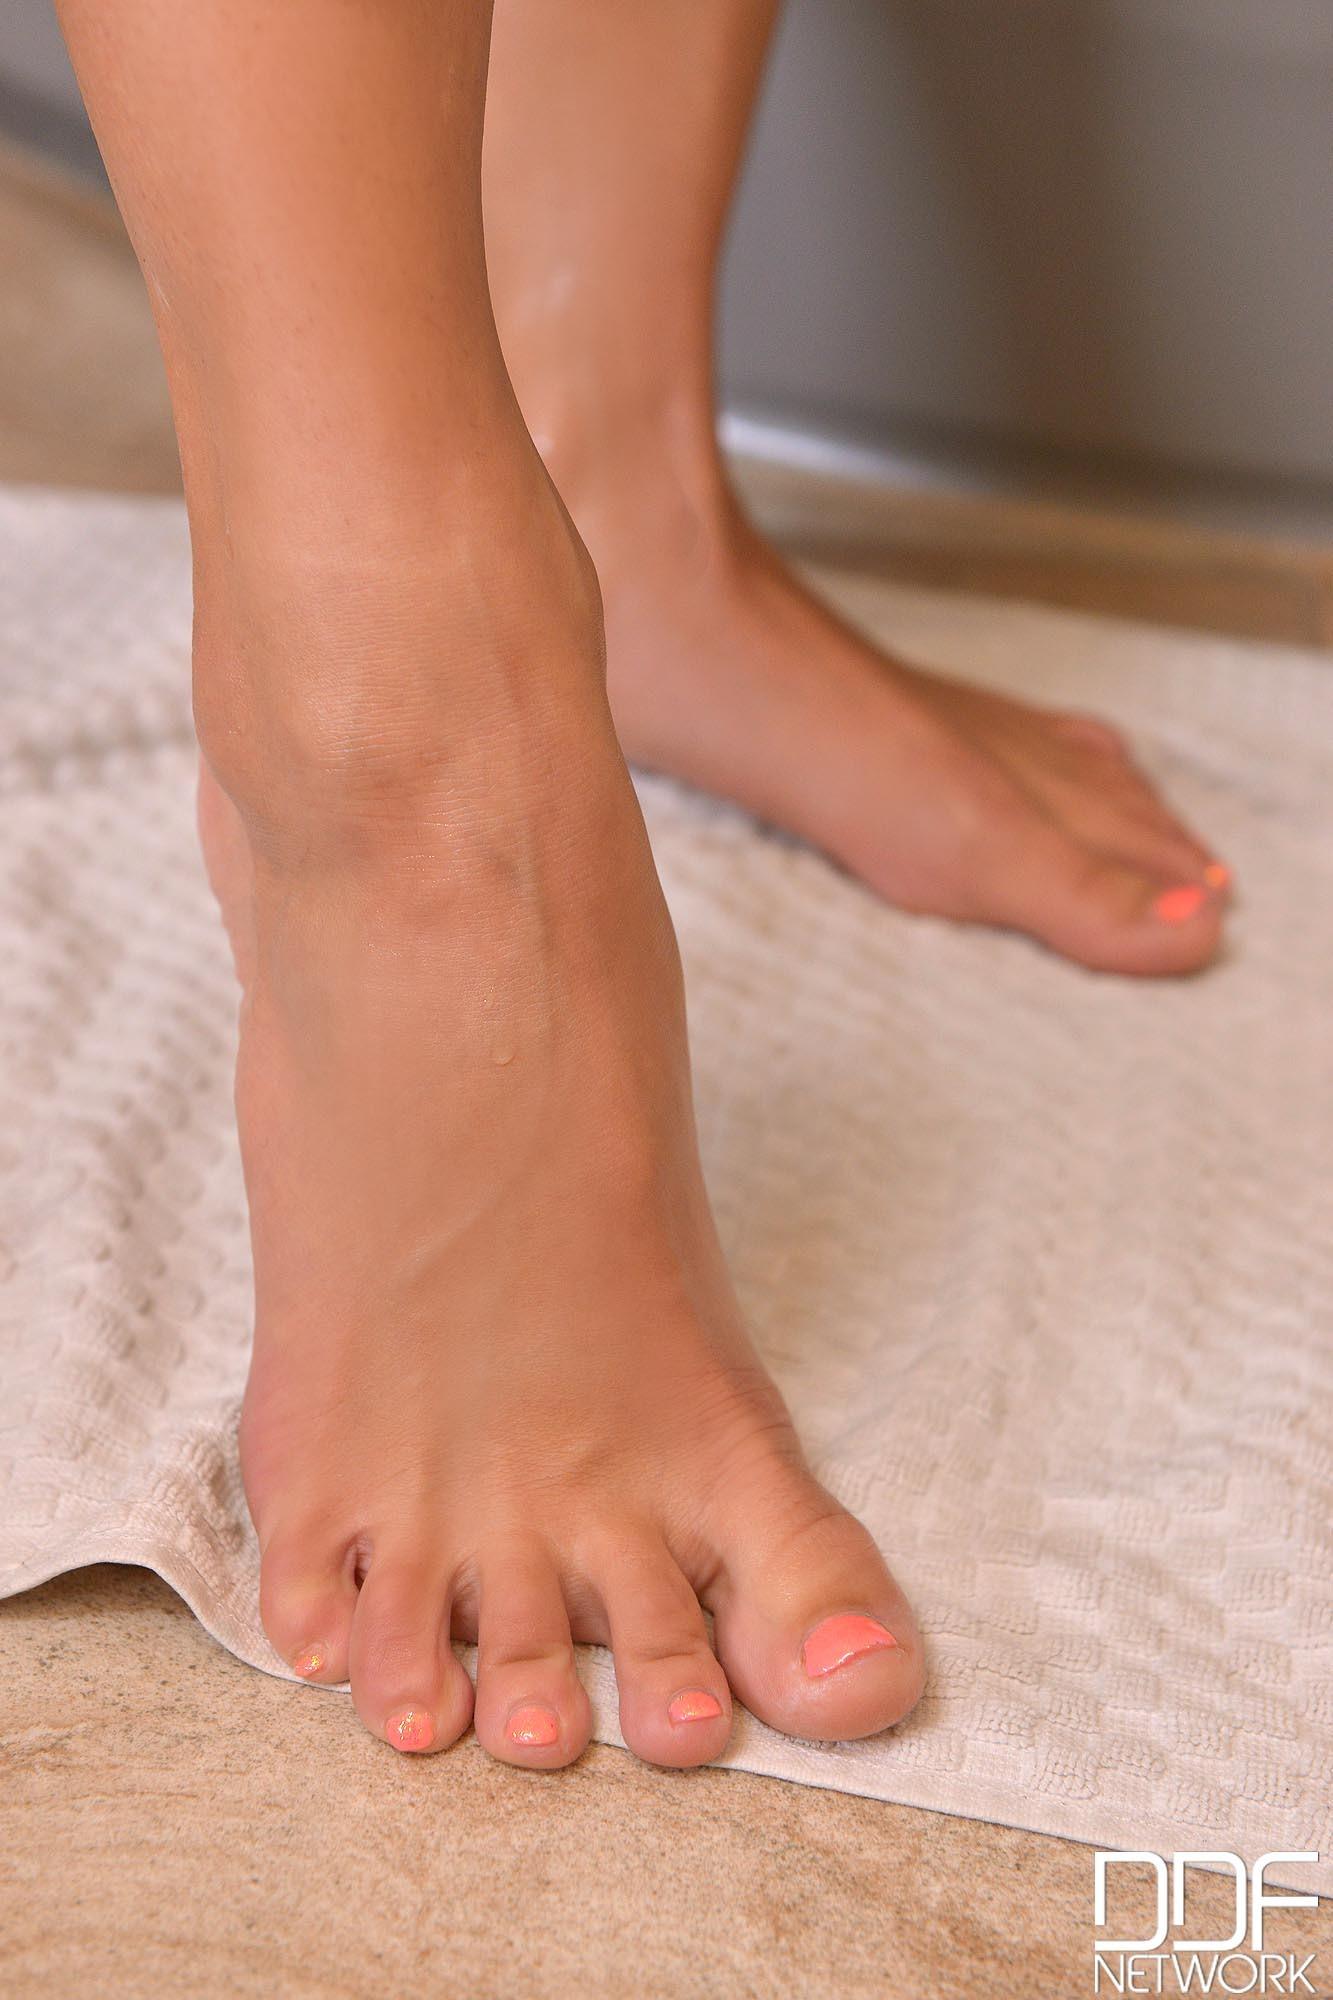 Mea melone feet